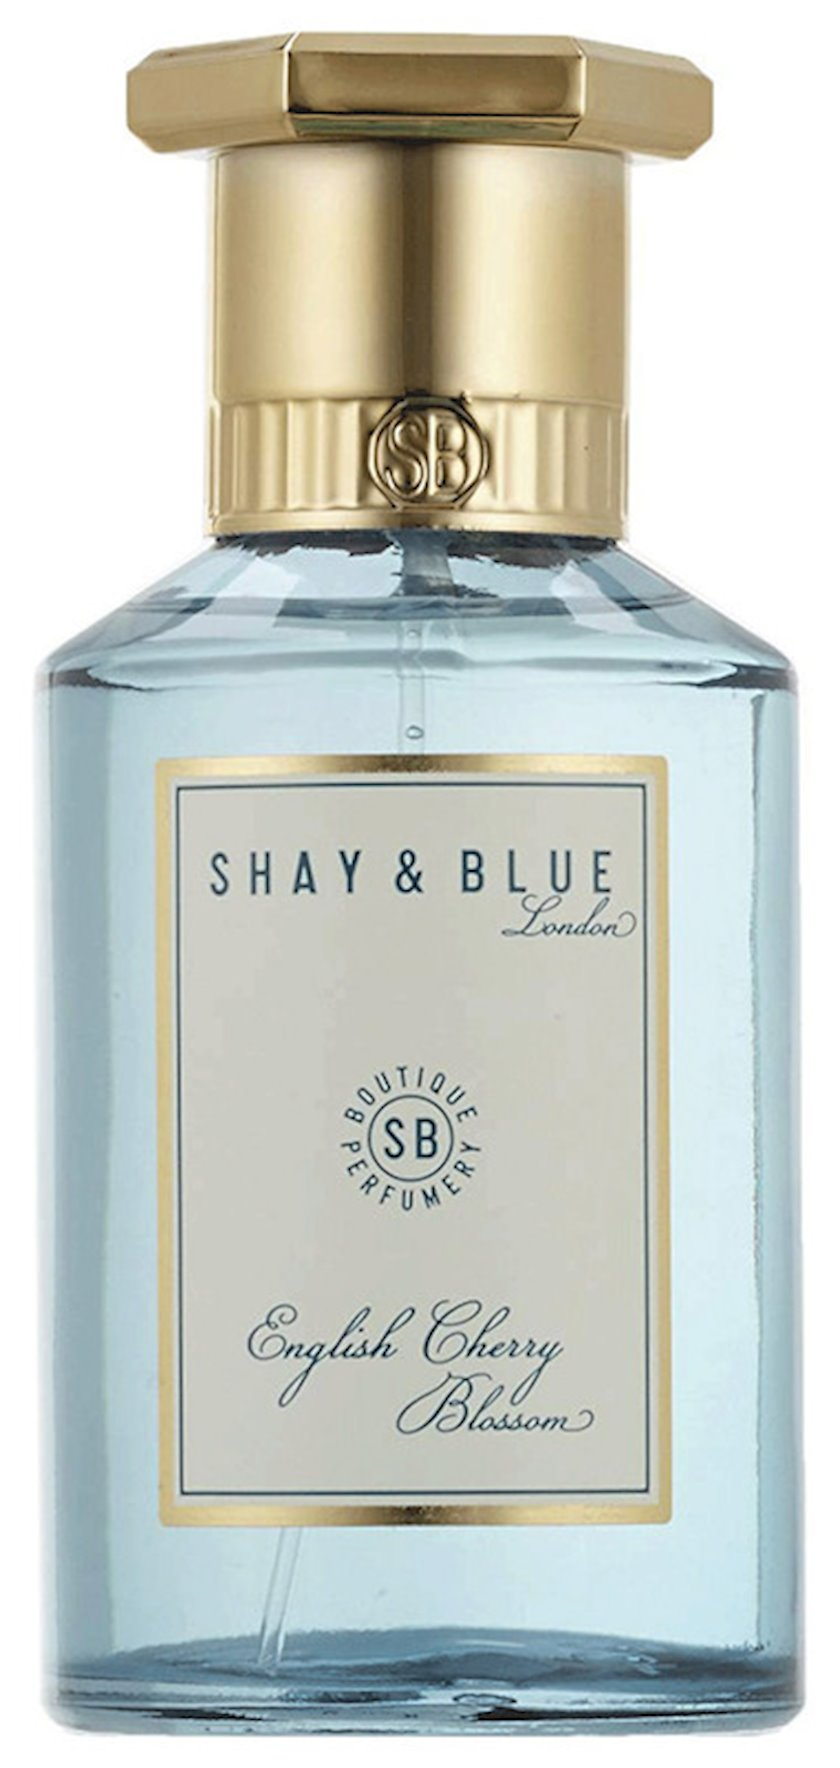 Uniseks ətir suyu Shay & Blue English Cherry Blossom Fragrance 100ml